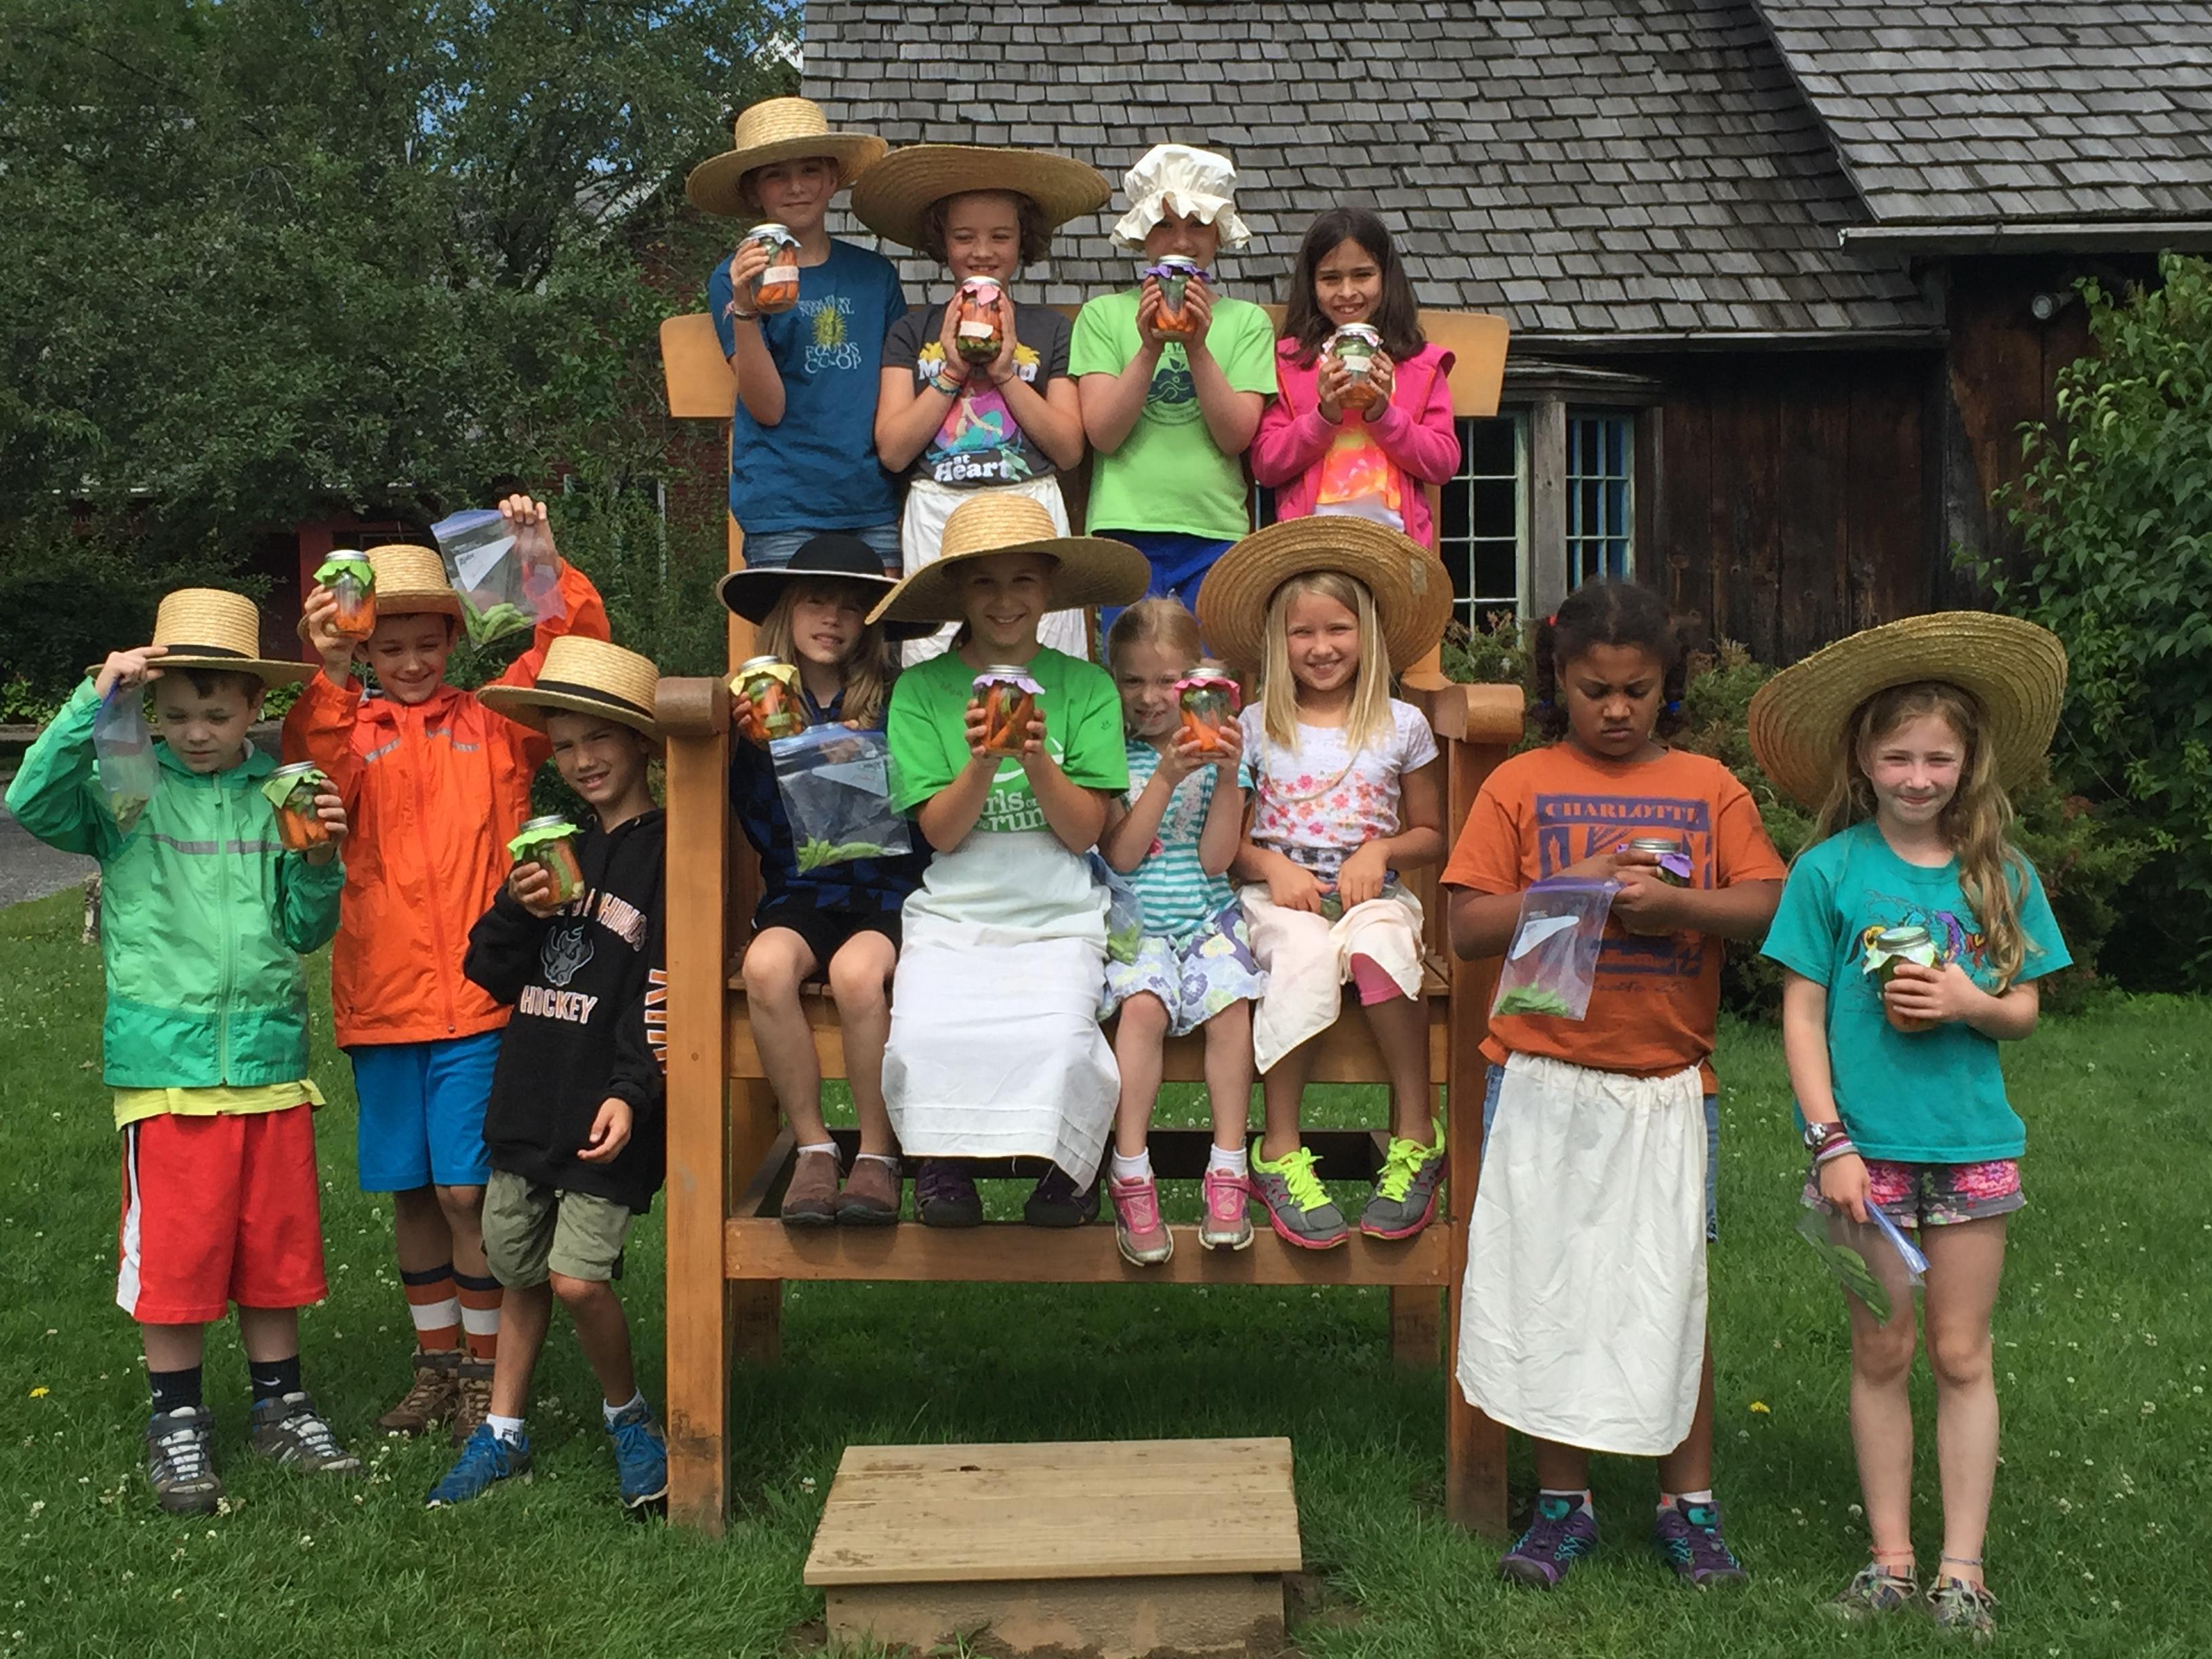 Summer Camp: A Week in 1795